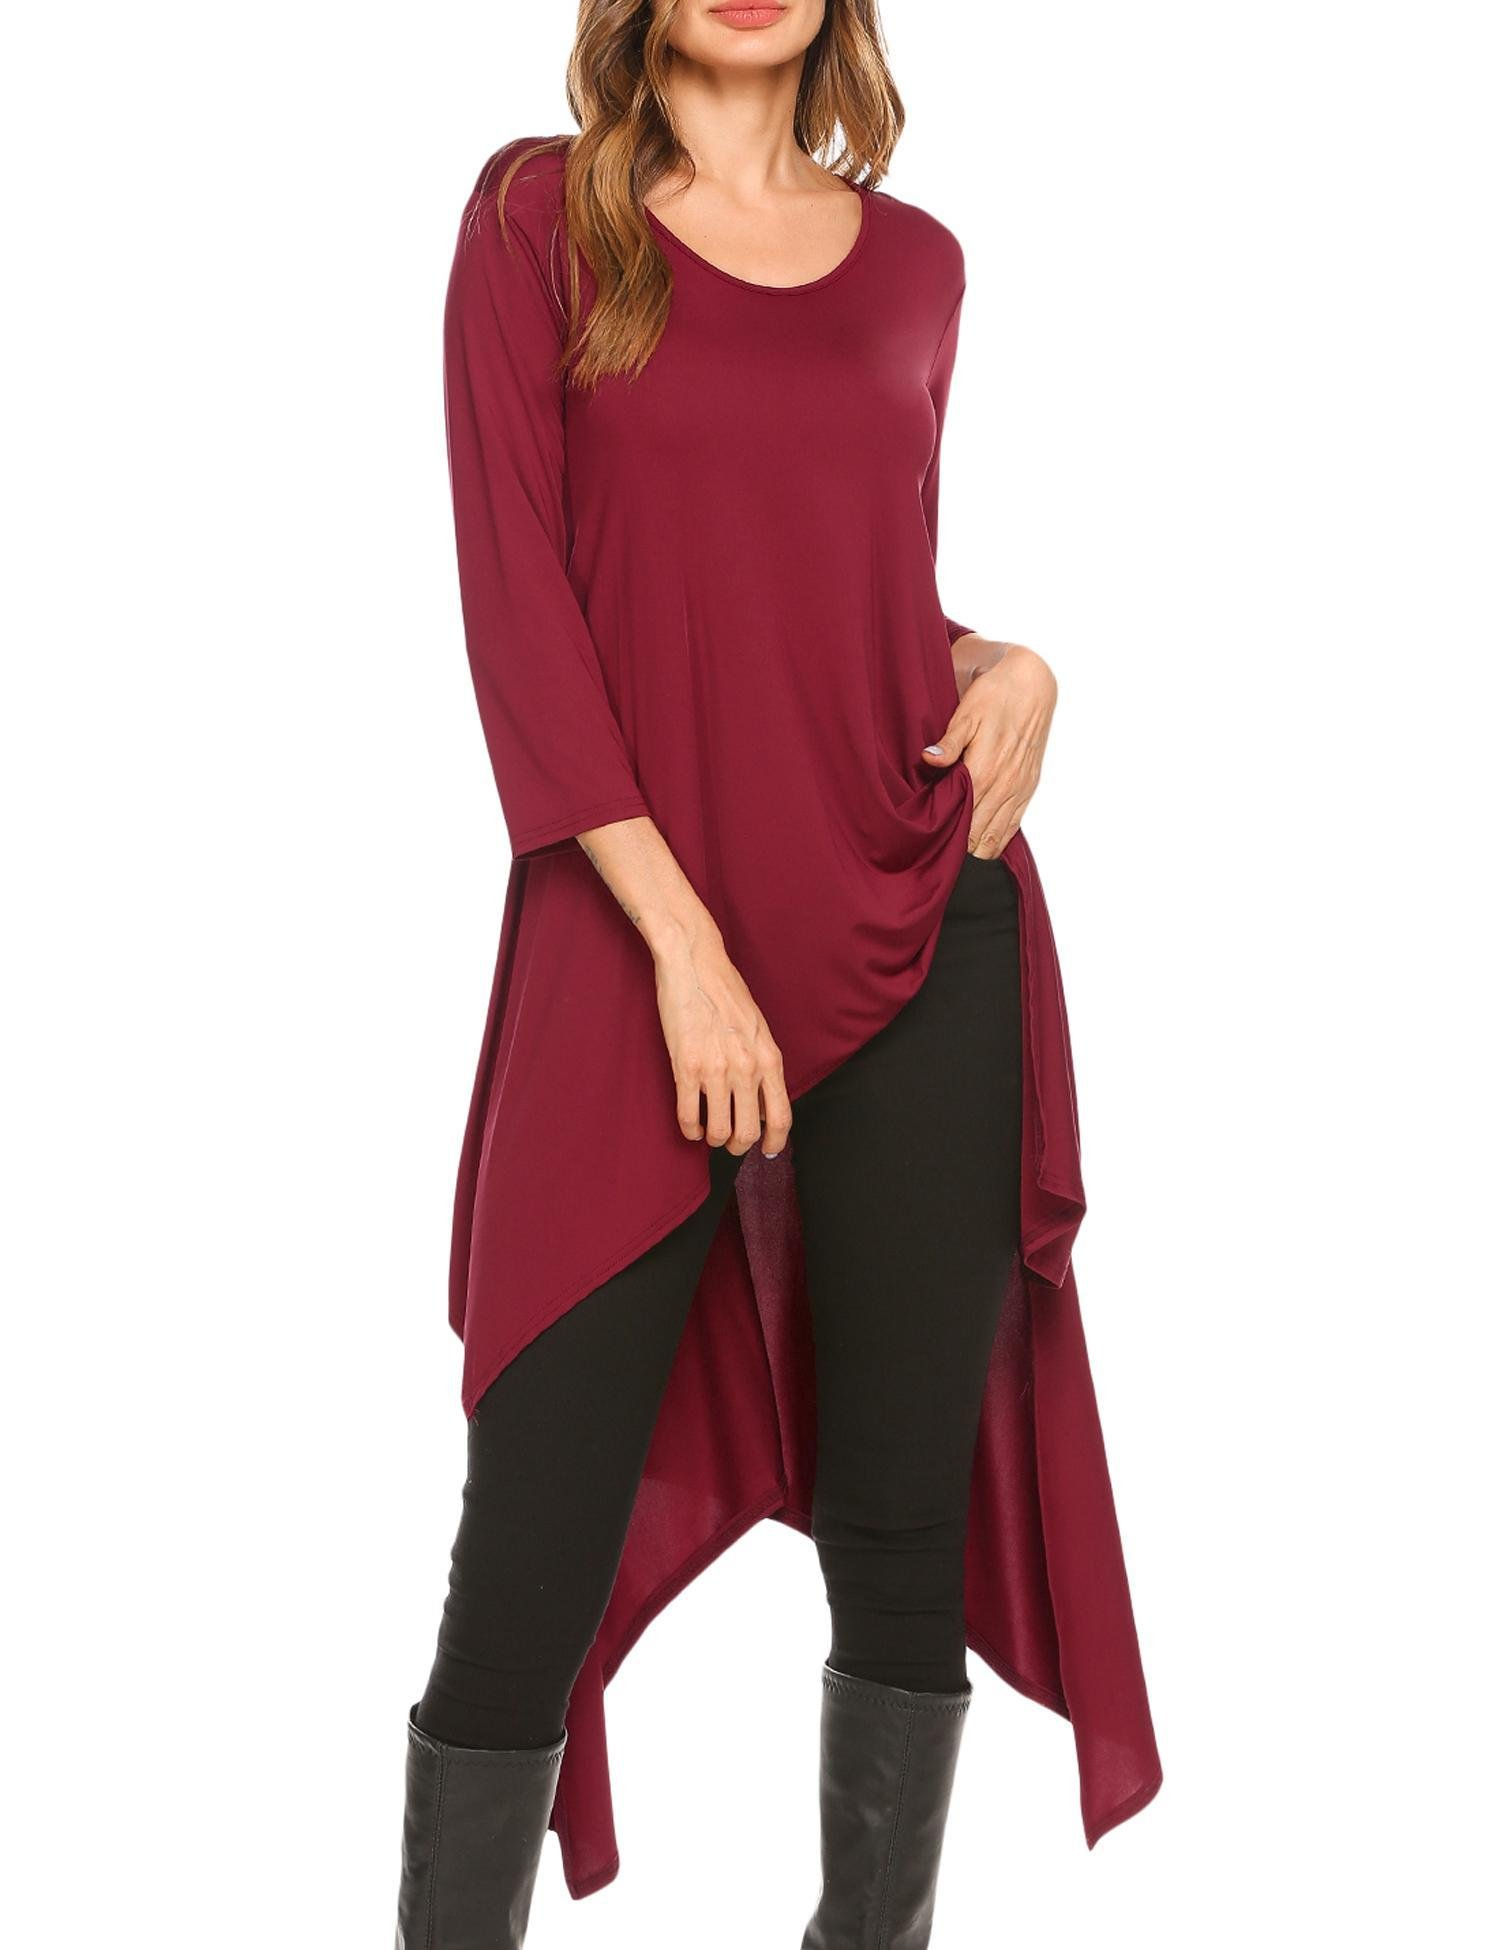 Mofavor Women's Casual Crewneck 3/4 Sleeve High Low Loose Swing T-Shirt Tunic